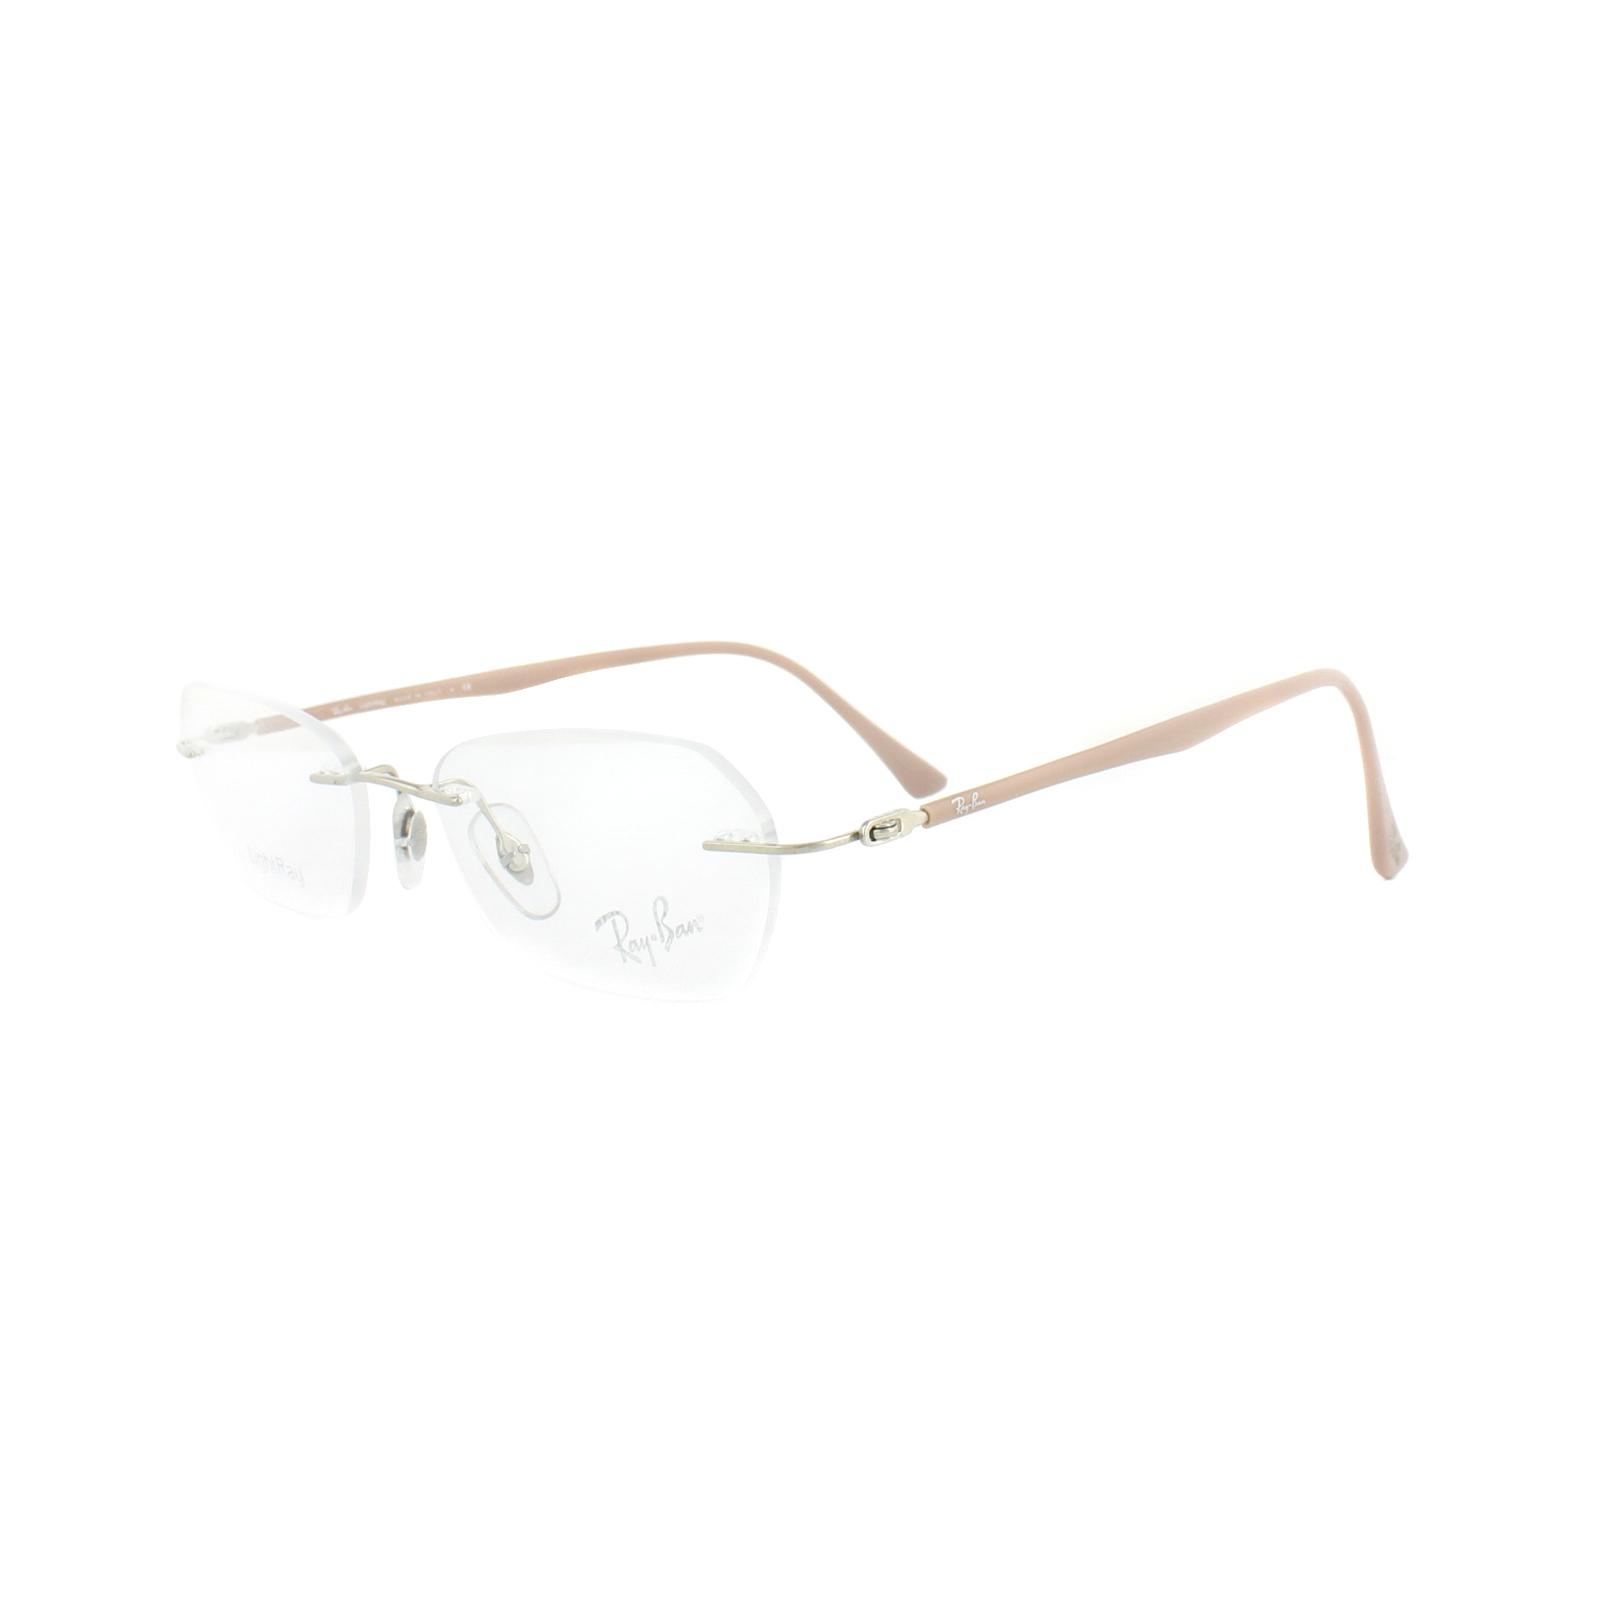 b01463eeea Sentinel Ray-Ban Glasses Frames RX 8703 1145 Silver Beige Mens 50mm